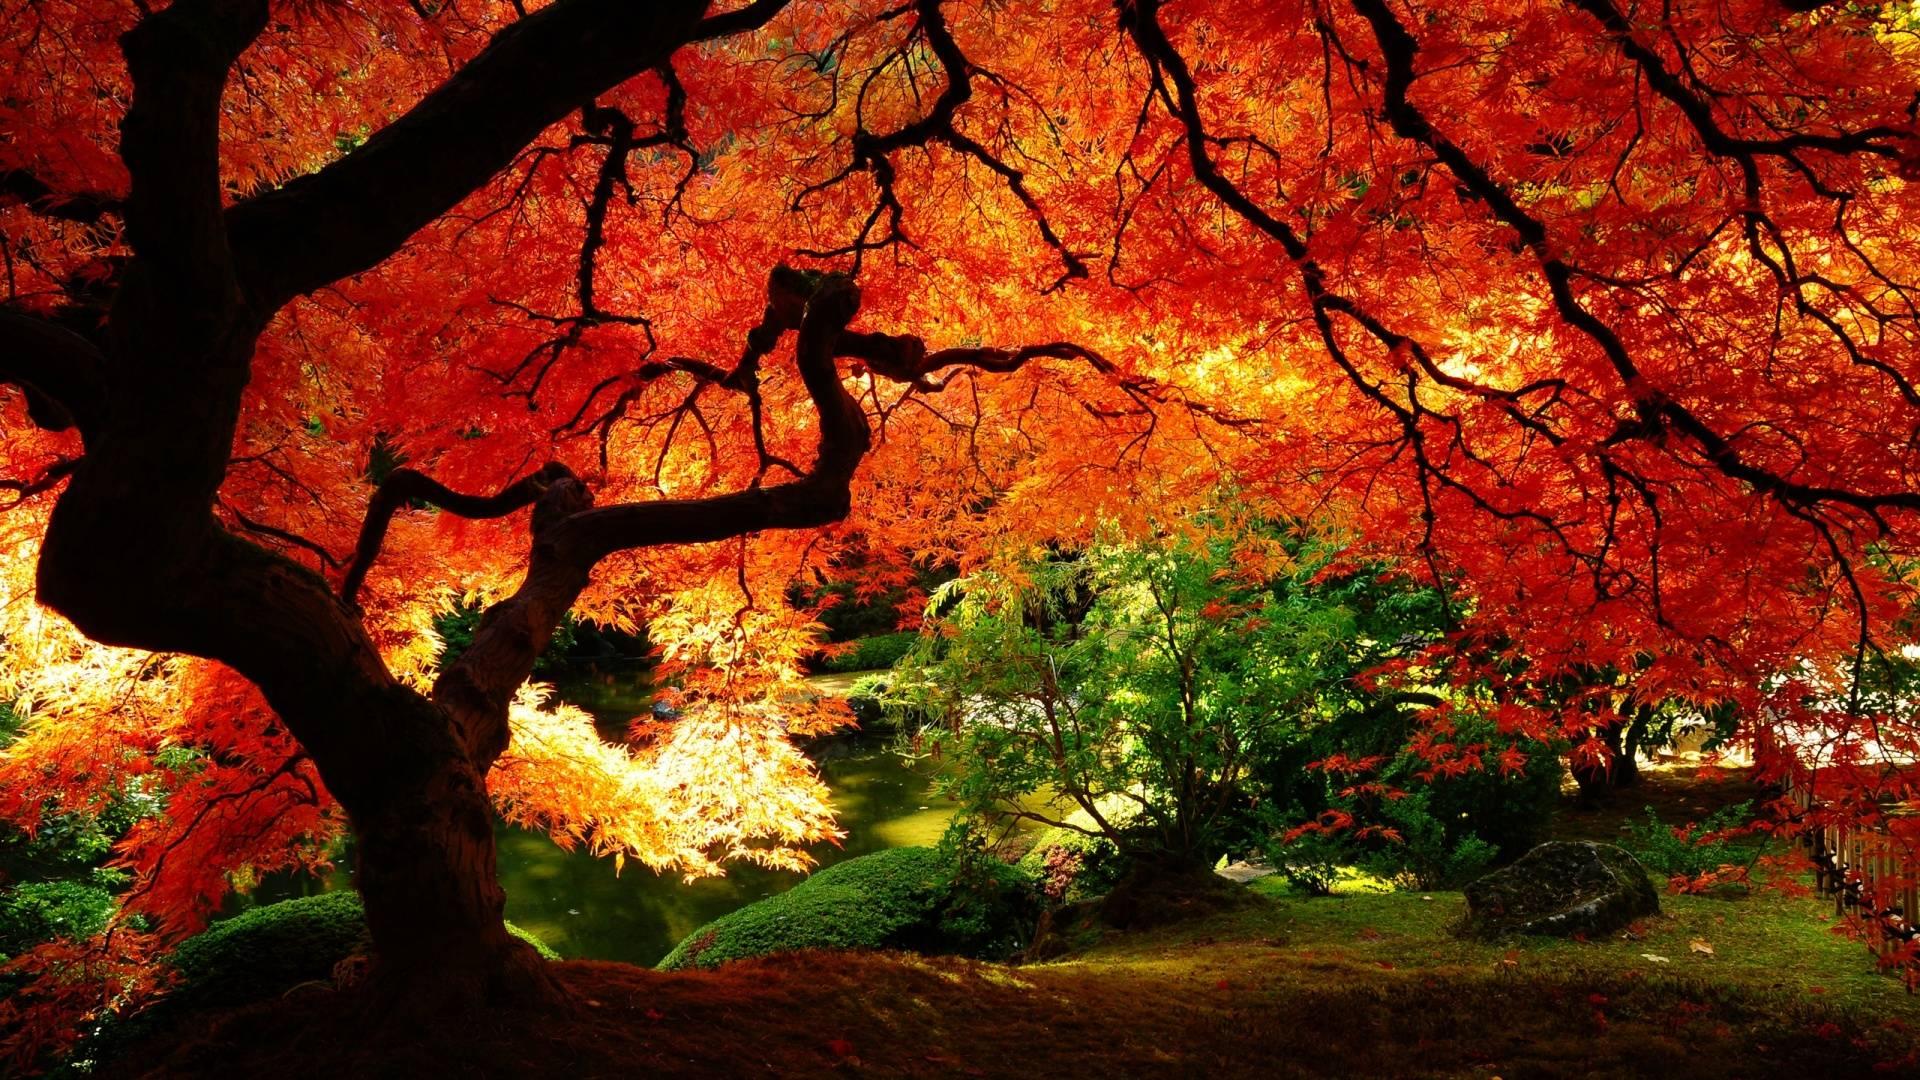 Fall Desktop Wallpaper 15902 2048x1361 px